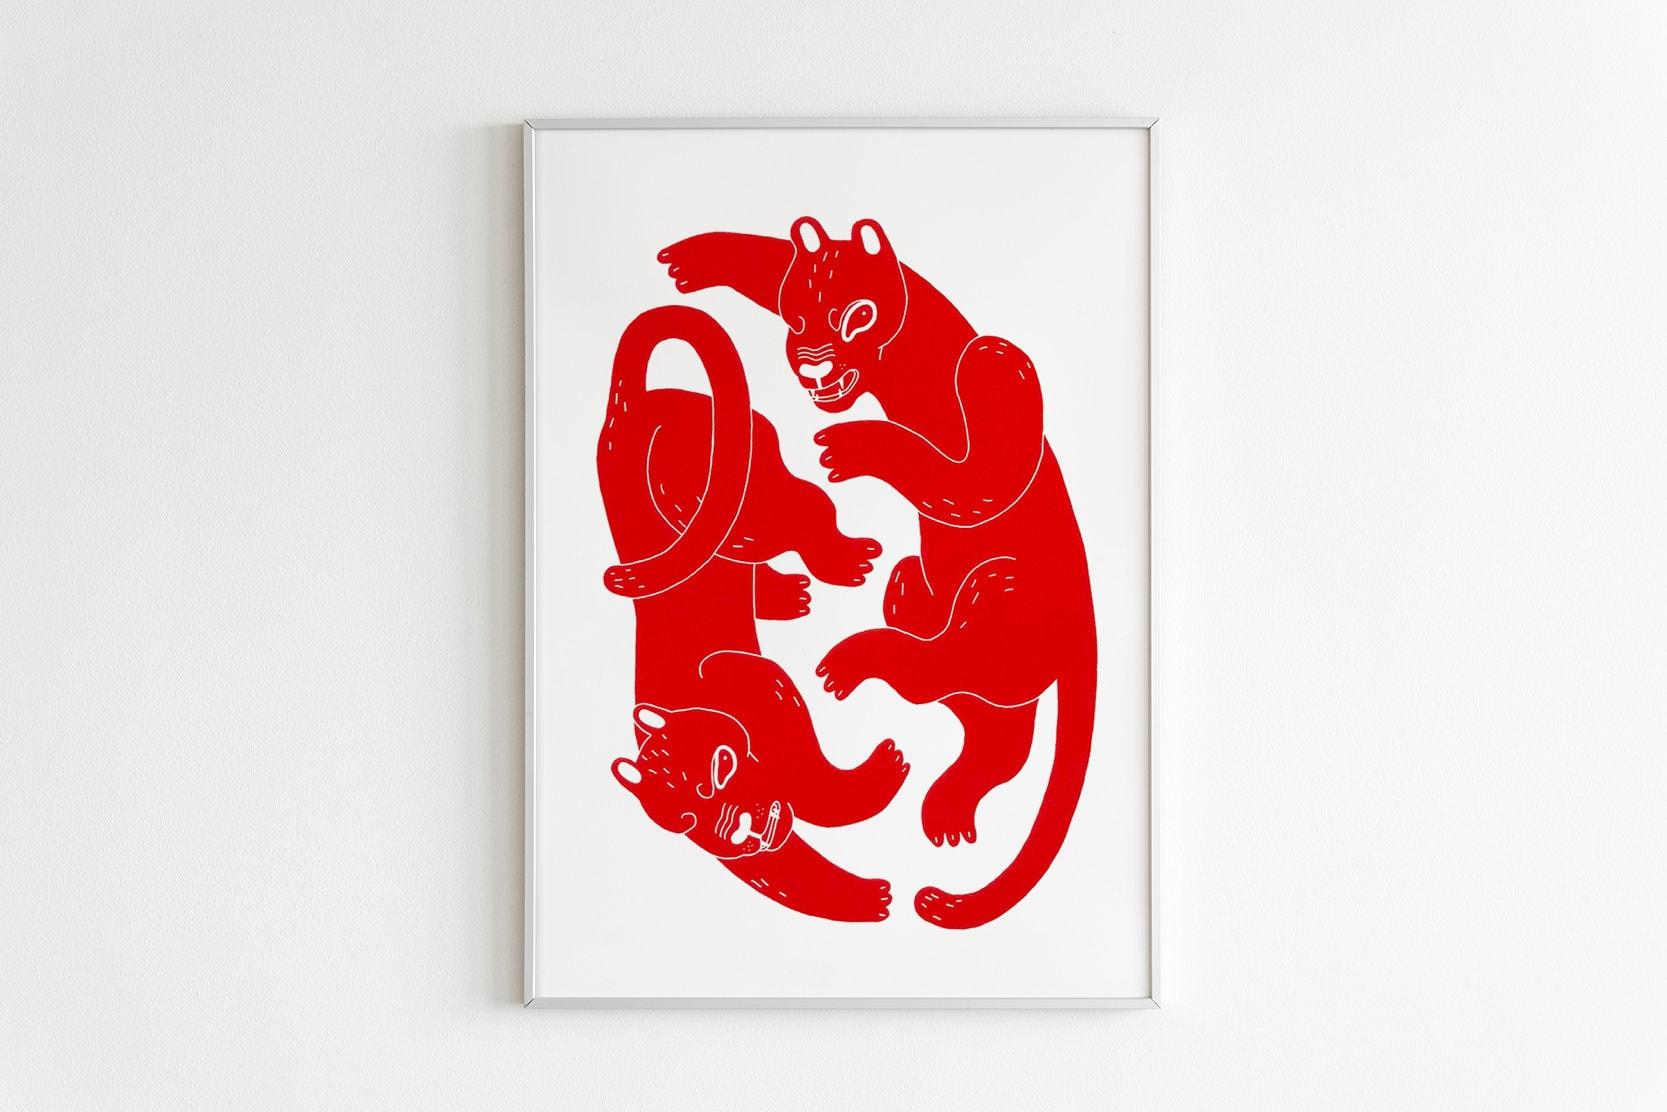 Elsa-Saunier-serigraphie-atelier-fwells-tigre-poster